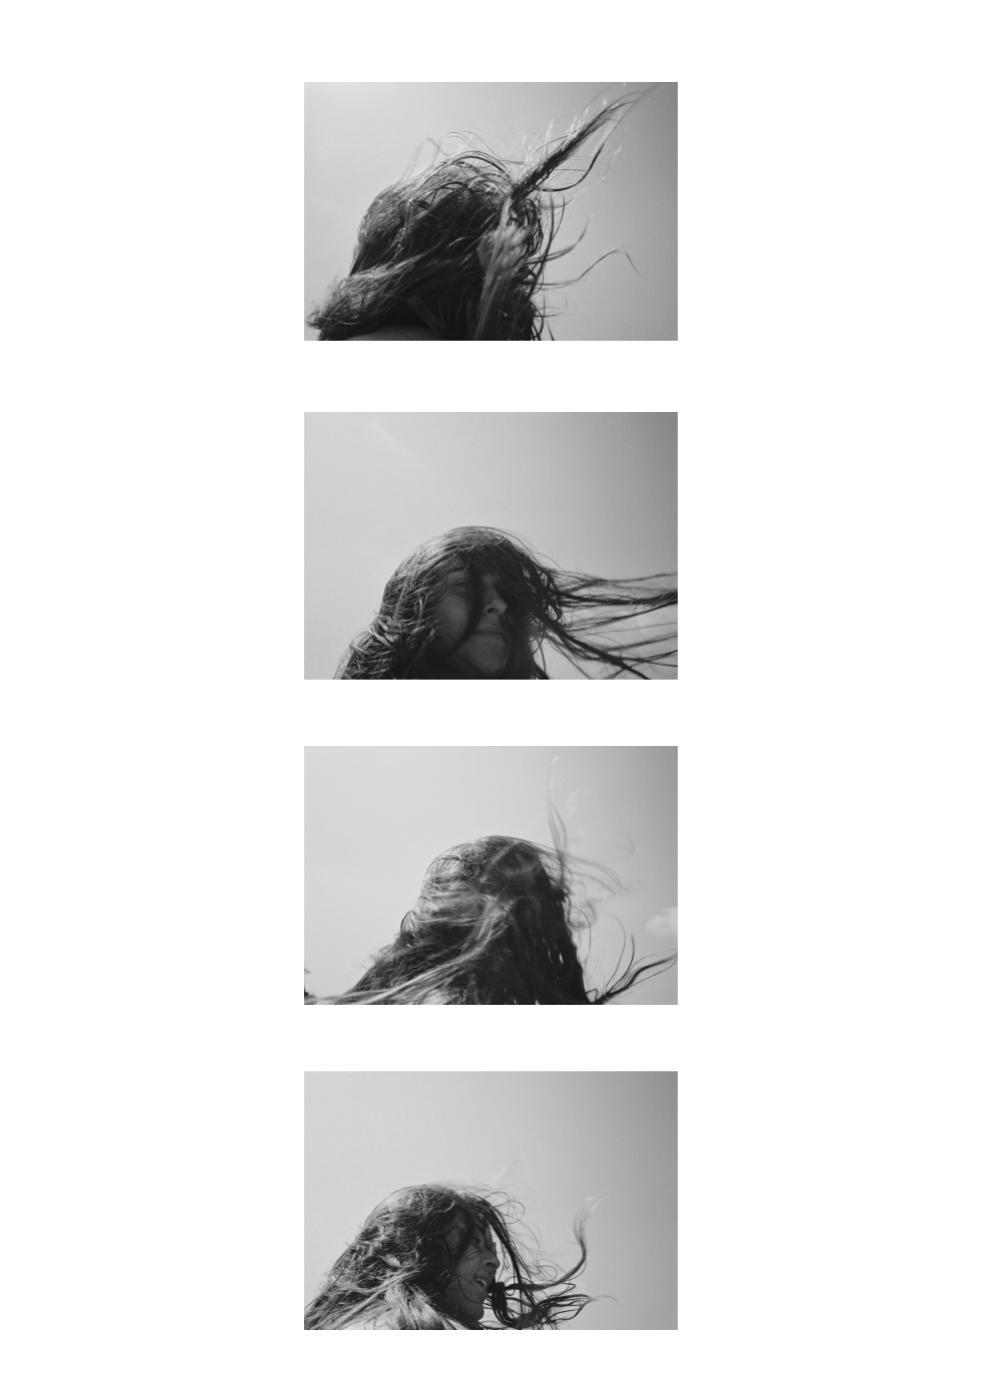 Heinrich Barth Booklet X Arturo Bamboo %2F version 1 (1).jpg